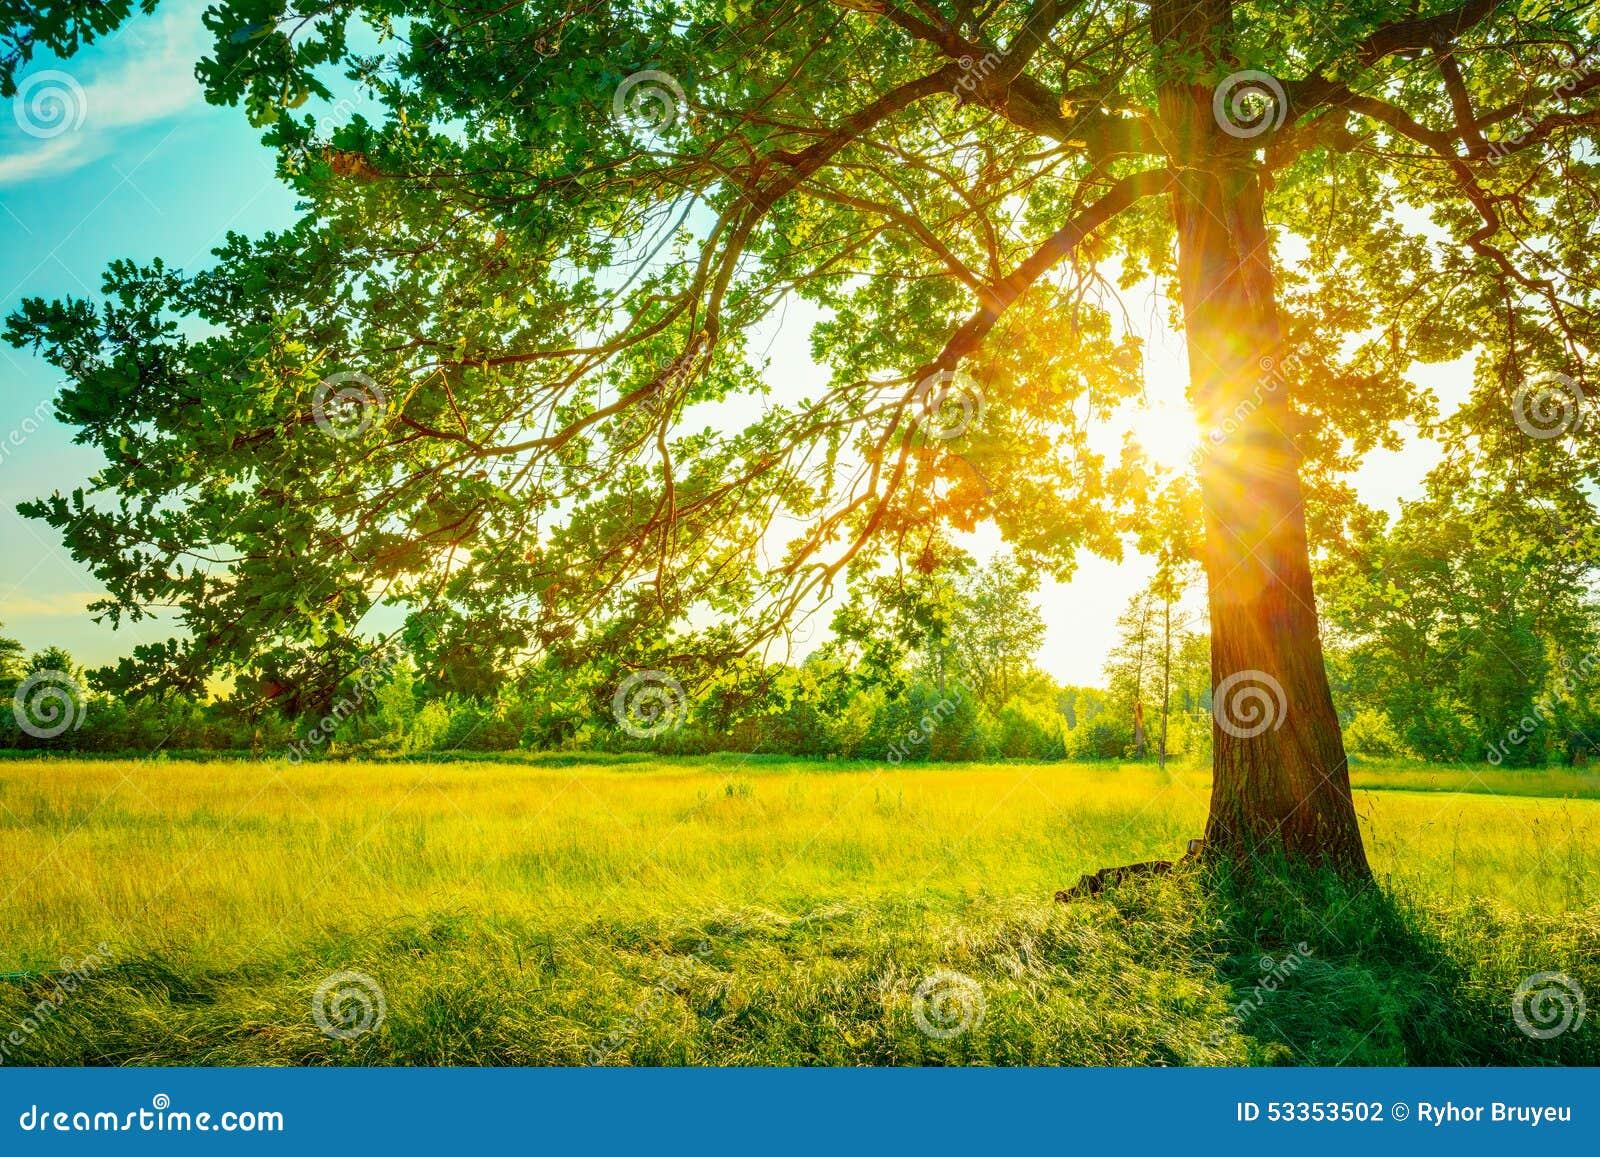 Été Sunny Forest Trees And Green Grass nature